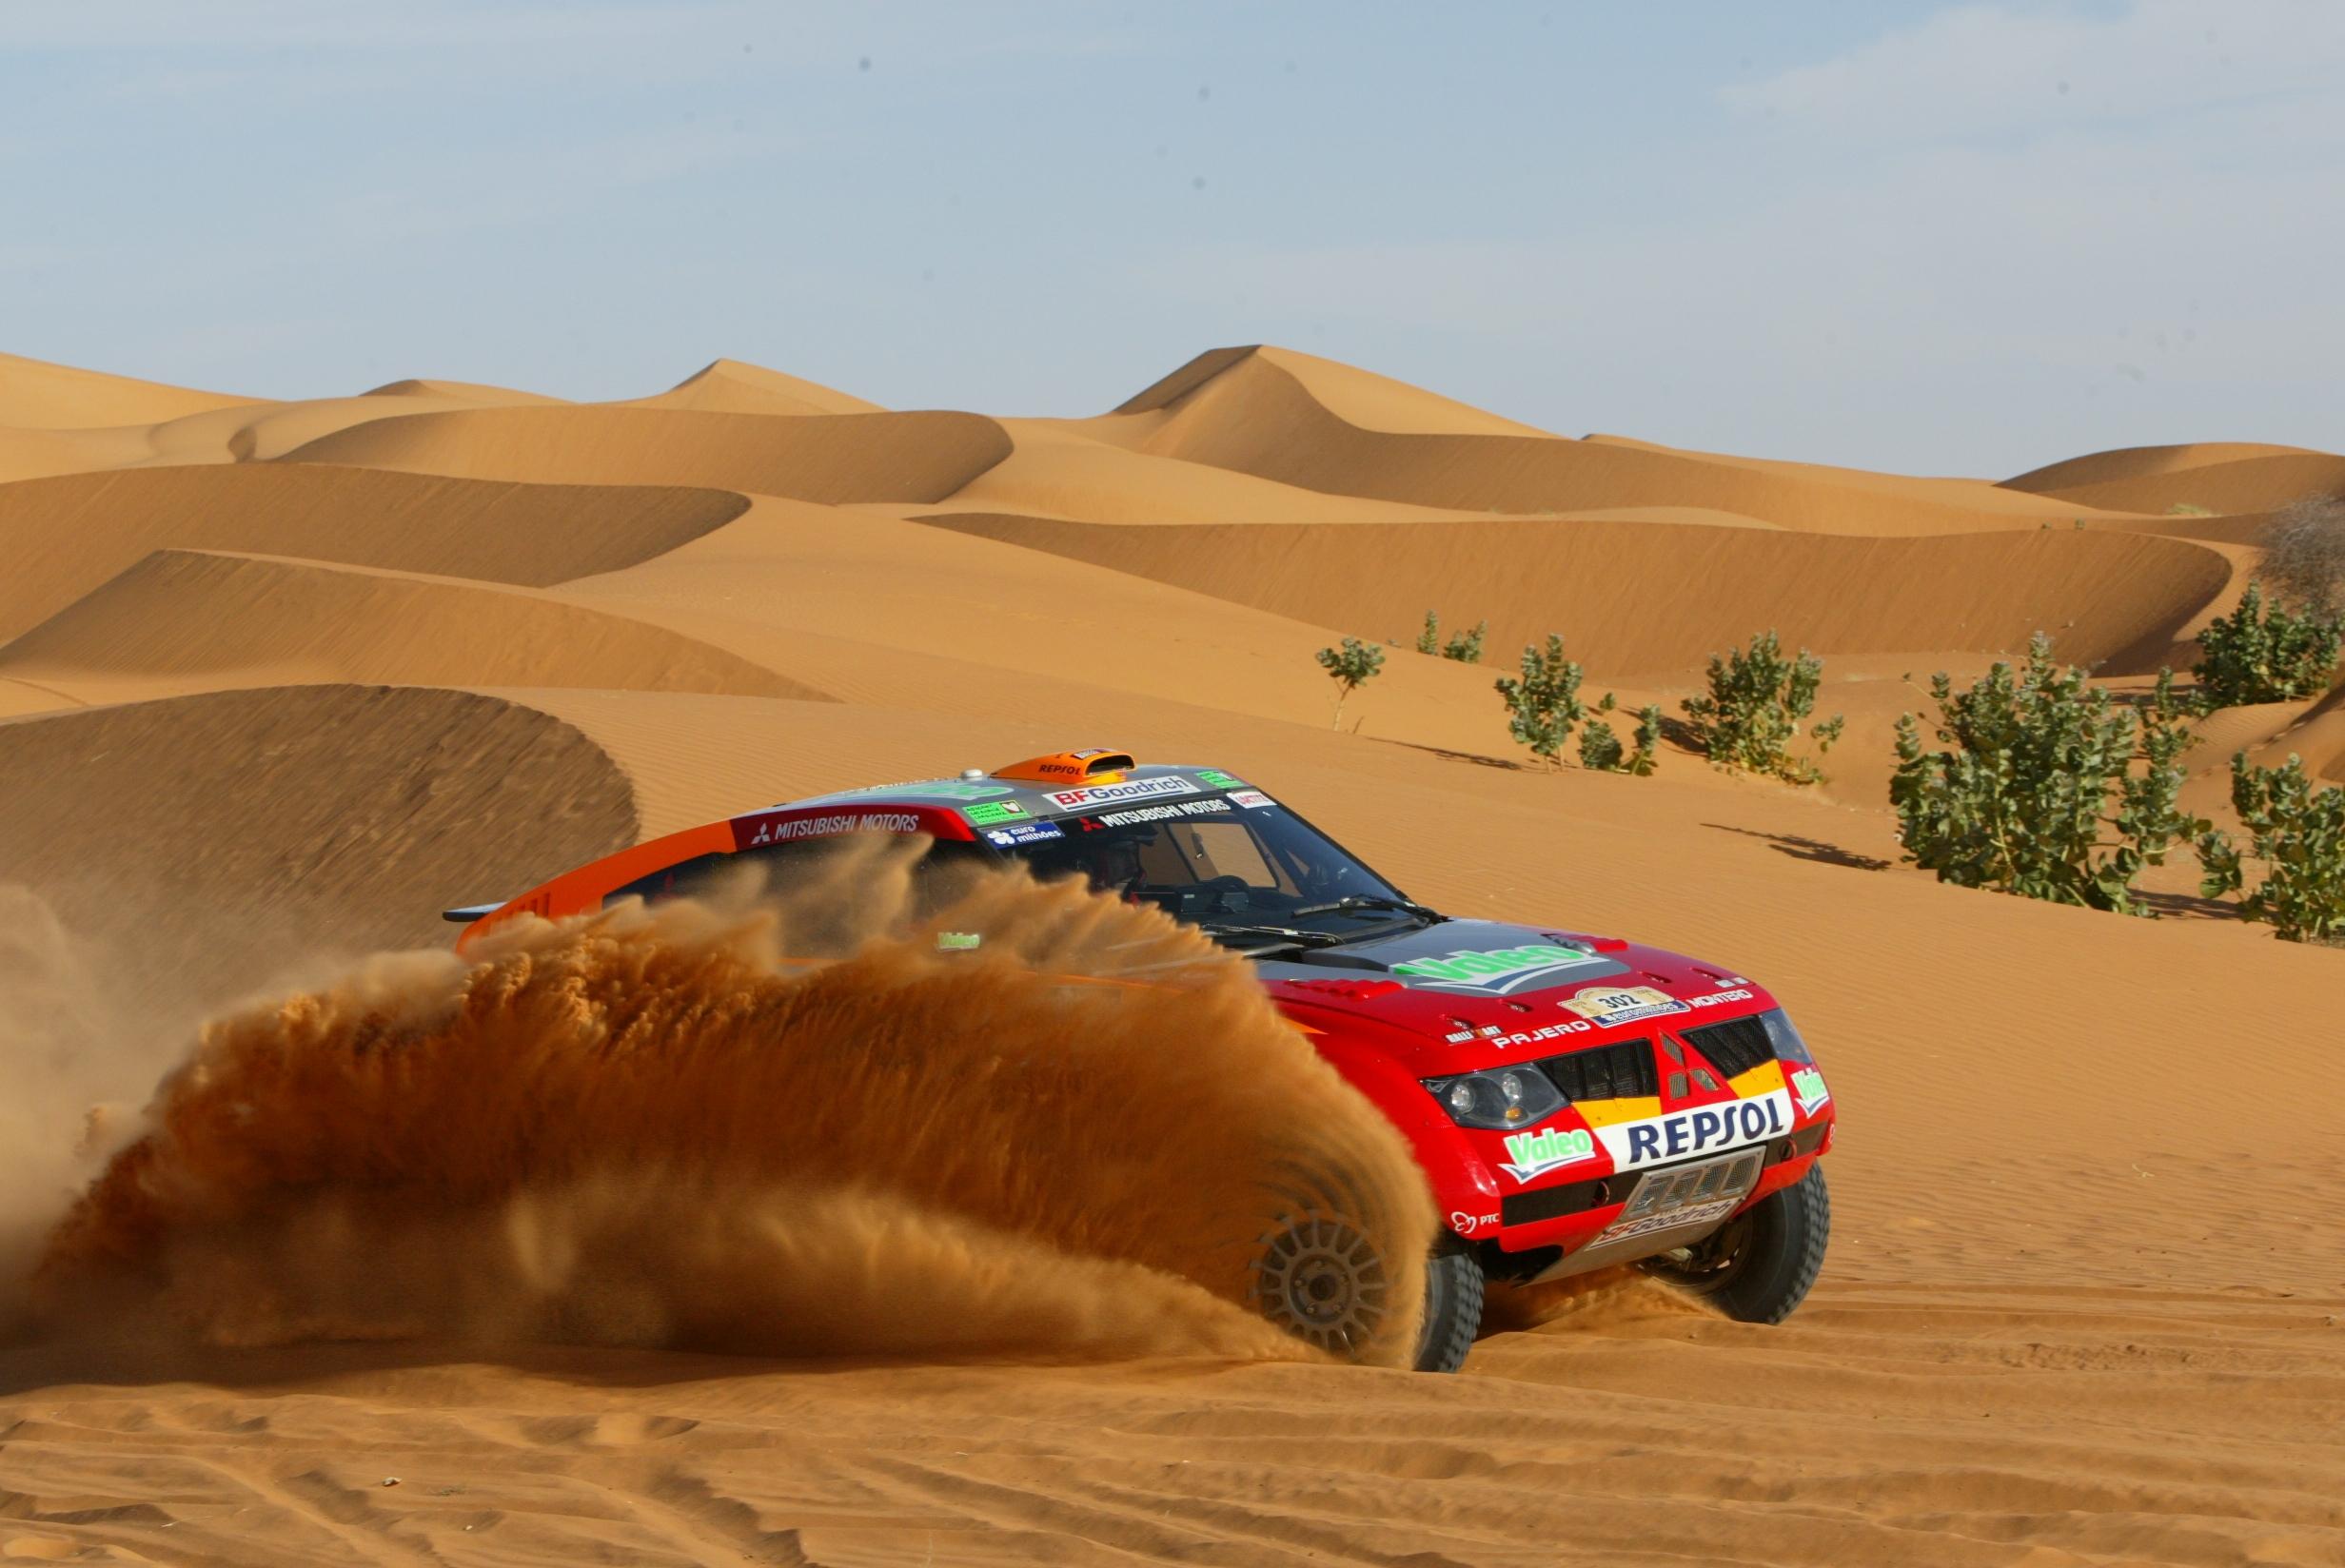 Dakar red rally car, гонка ралли Дакар, скачать фото, обои на рабочий стол